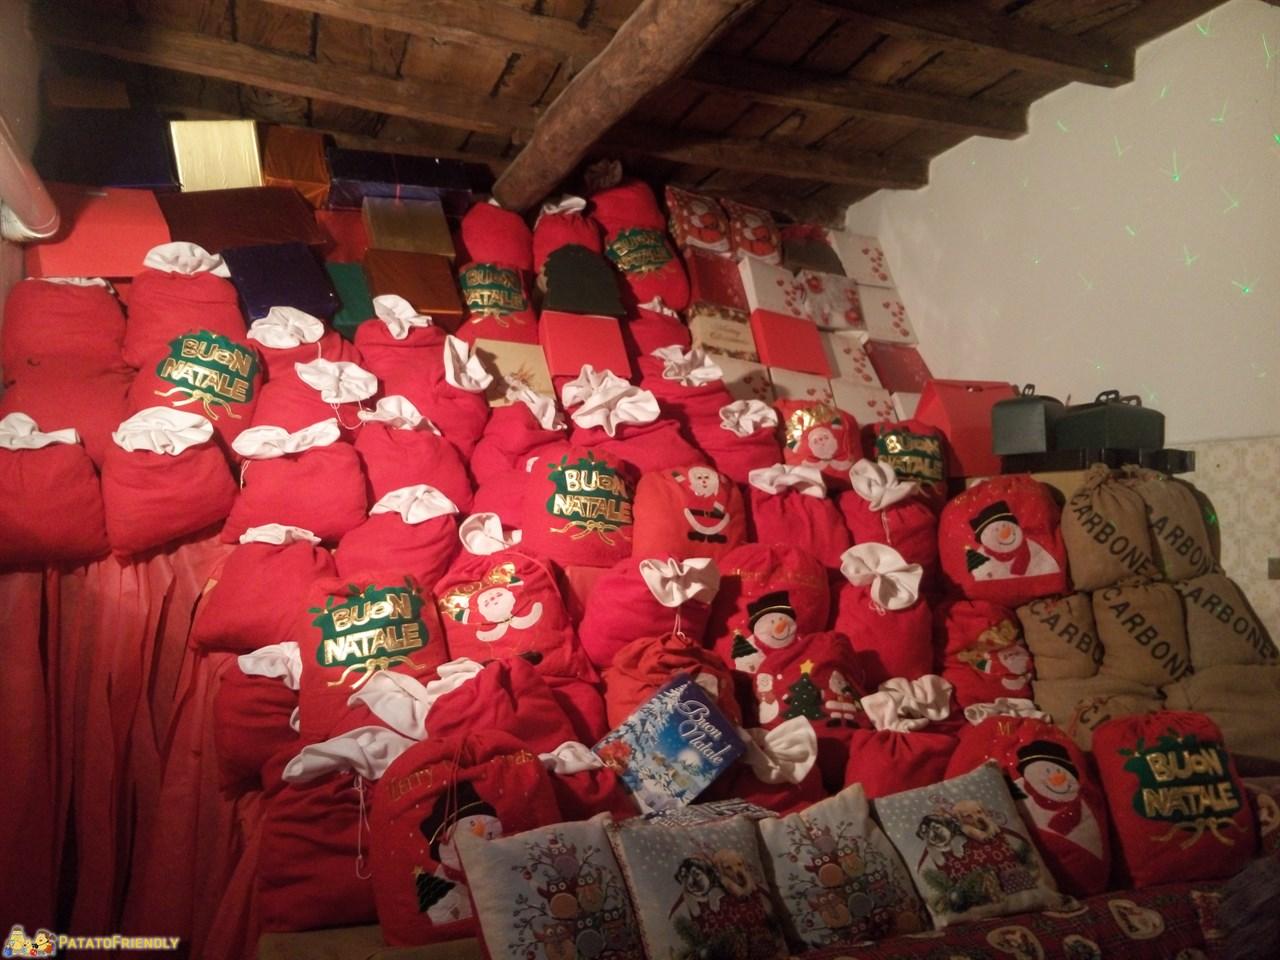 [cml_media_alt id='8839']La Casa Bergamasca di Babbo Natale: i doni di Natale[/cml_media_alt]